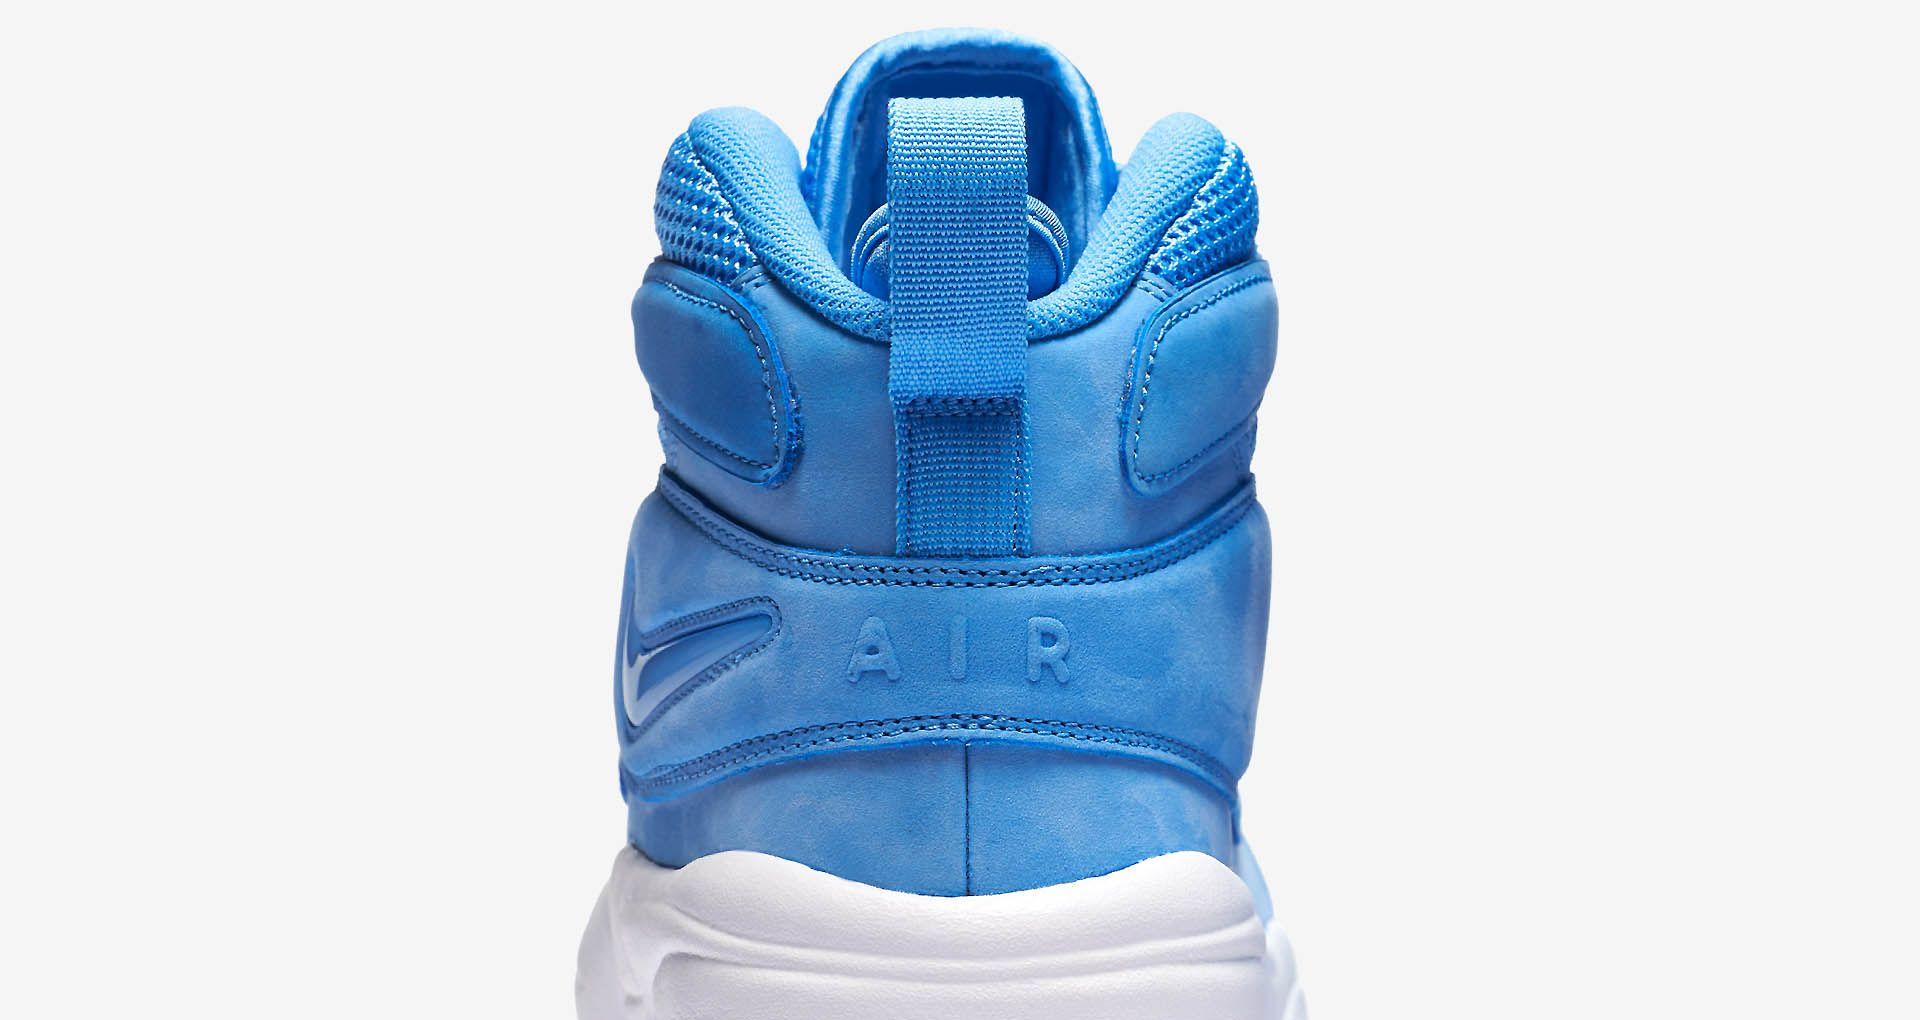 96b3c9b1a52 Nike Air Max2 Uptempo 94  University Blue . Nike+ SNKRS